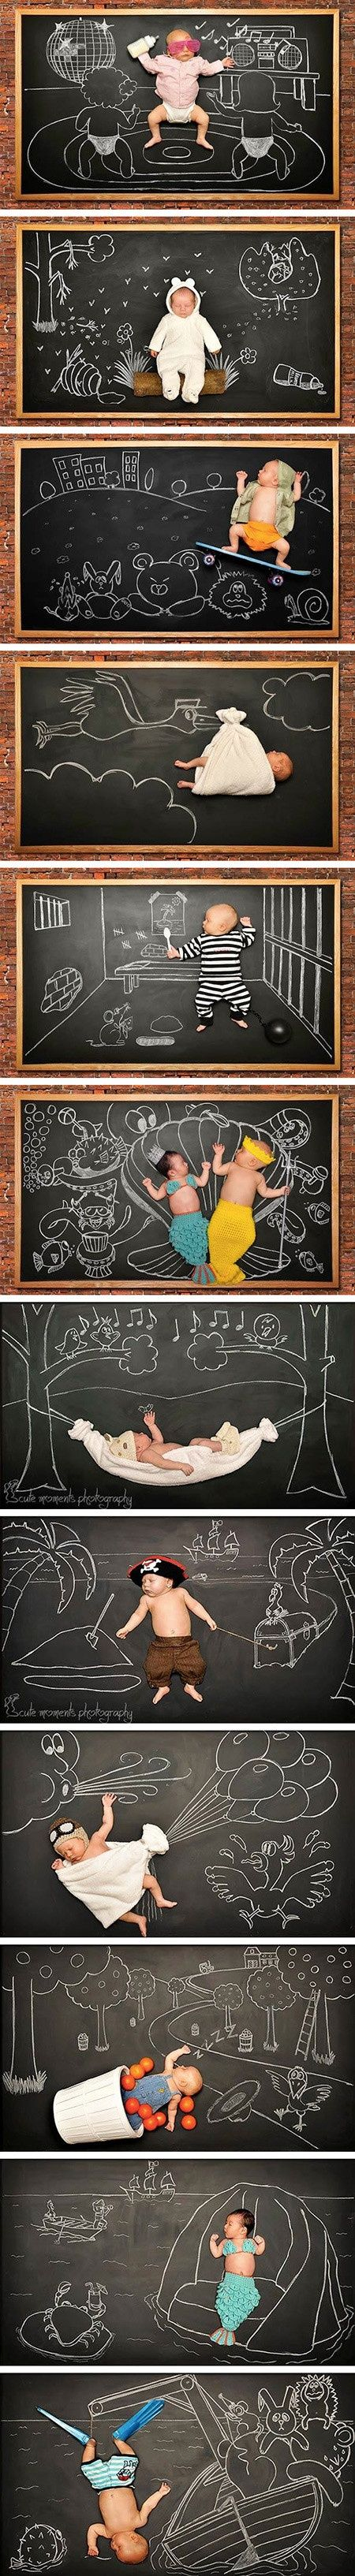 Chalkboard baby photos